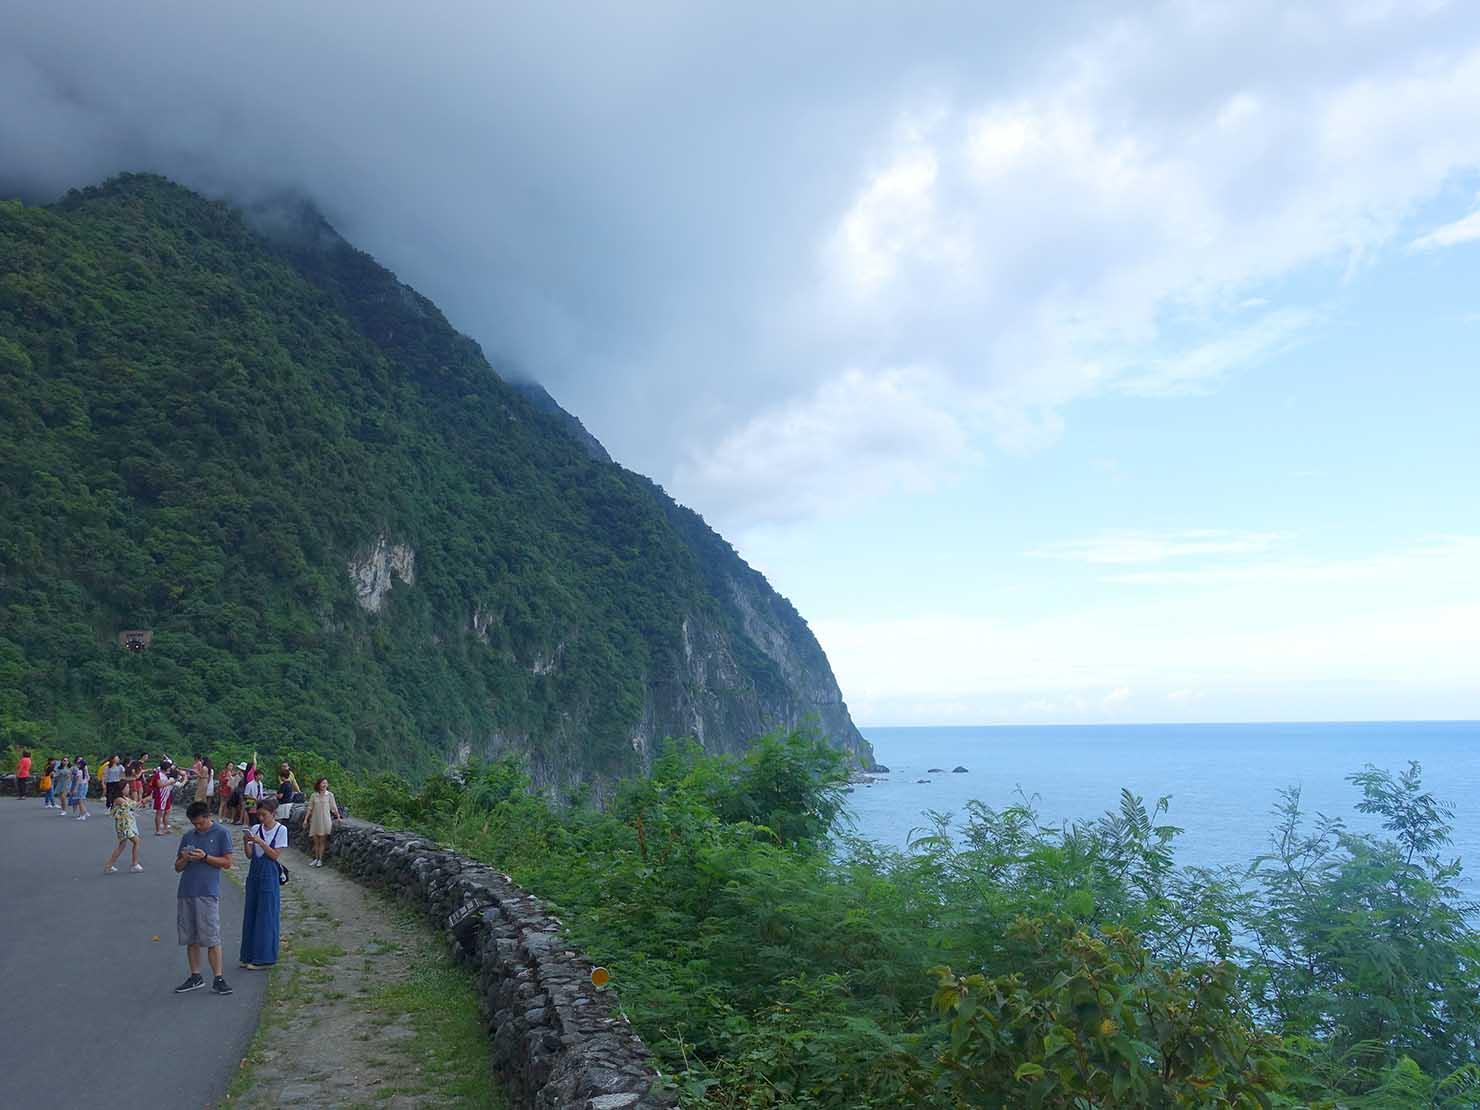 KKday外国人限定「花蓮・太魯閣(タロコ)日帰りツアー」清水斷崖を臨む展望台